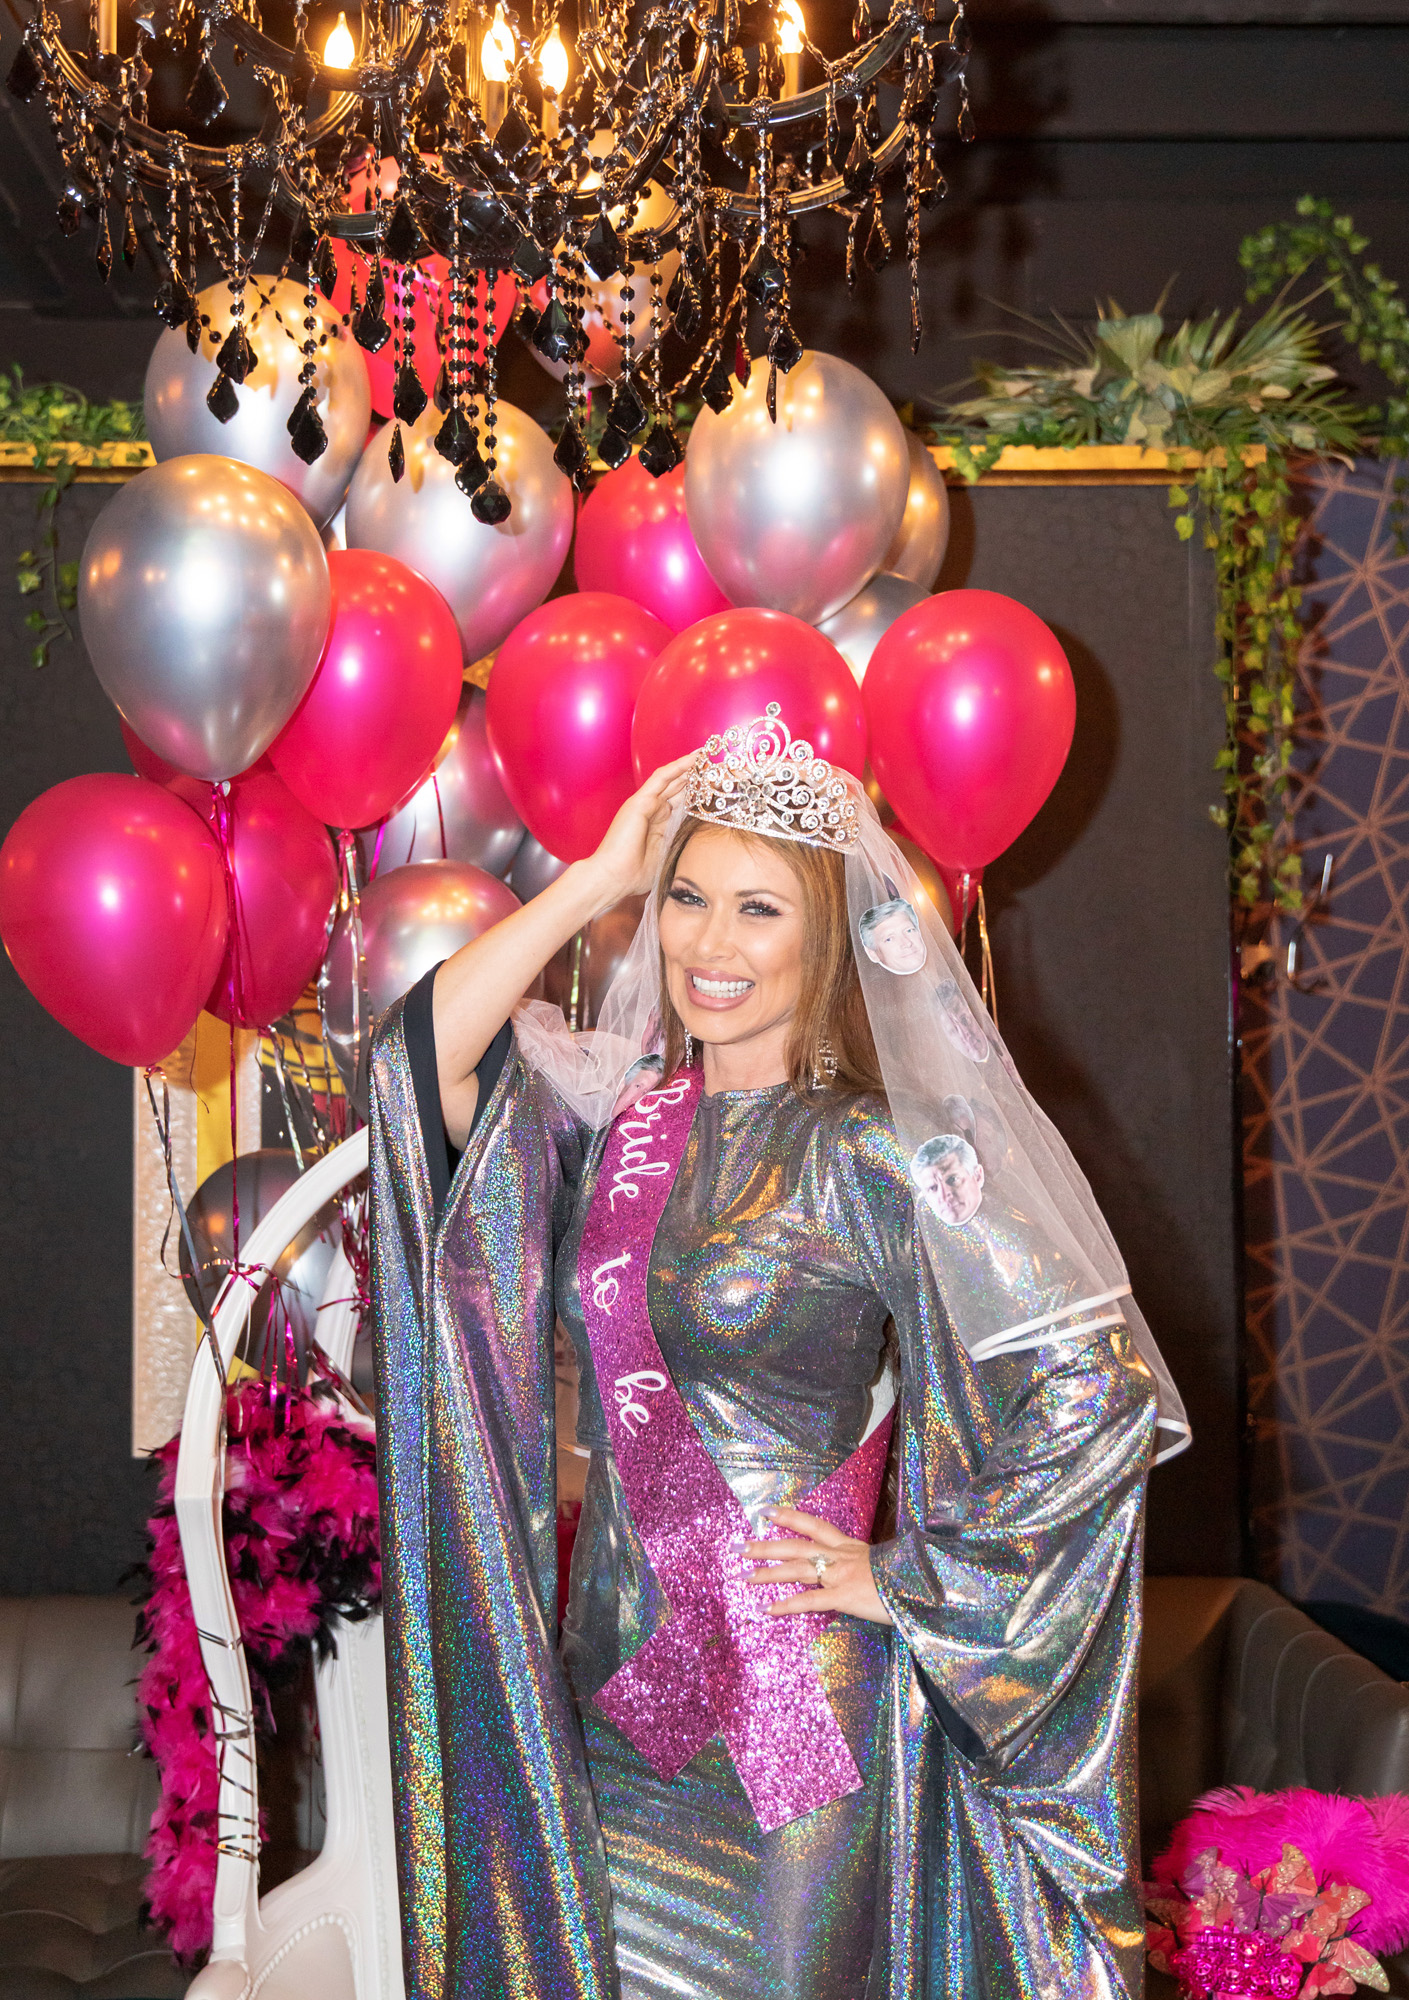 LeeAnne Locken Bachelorette Party Monika Normand Photography